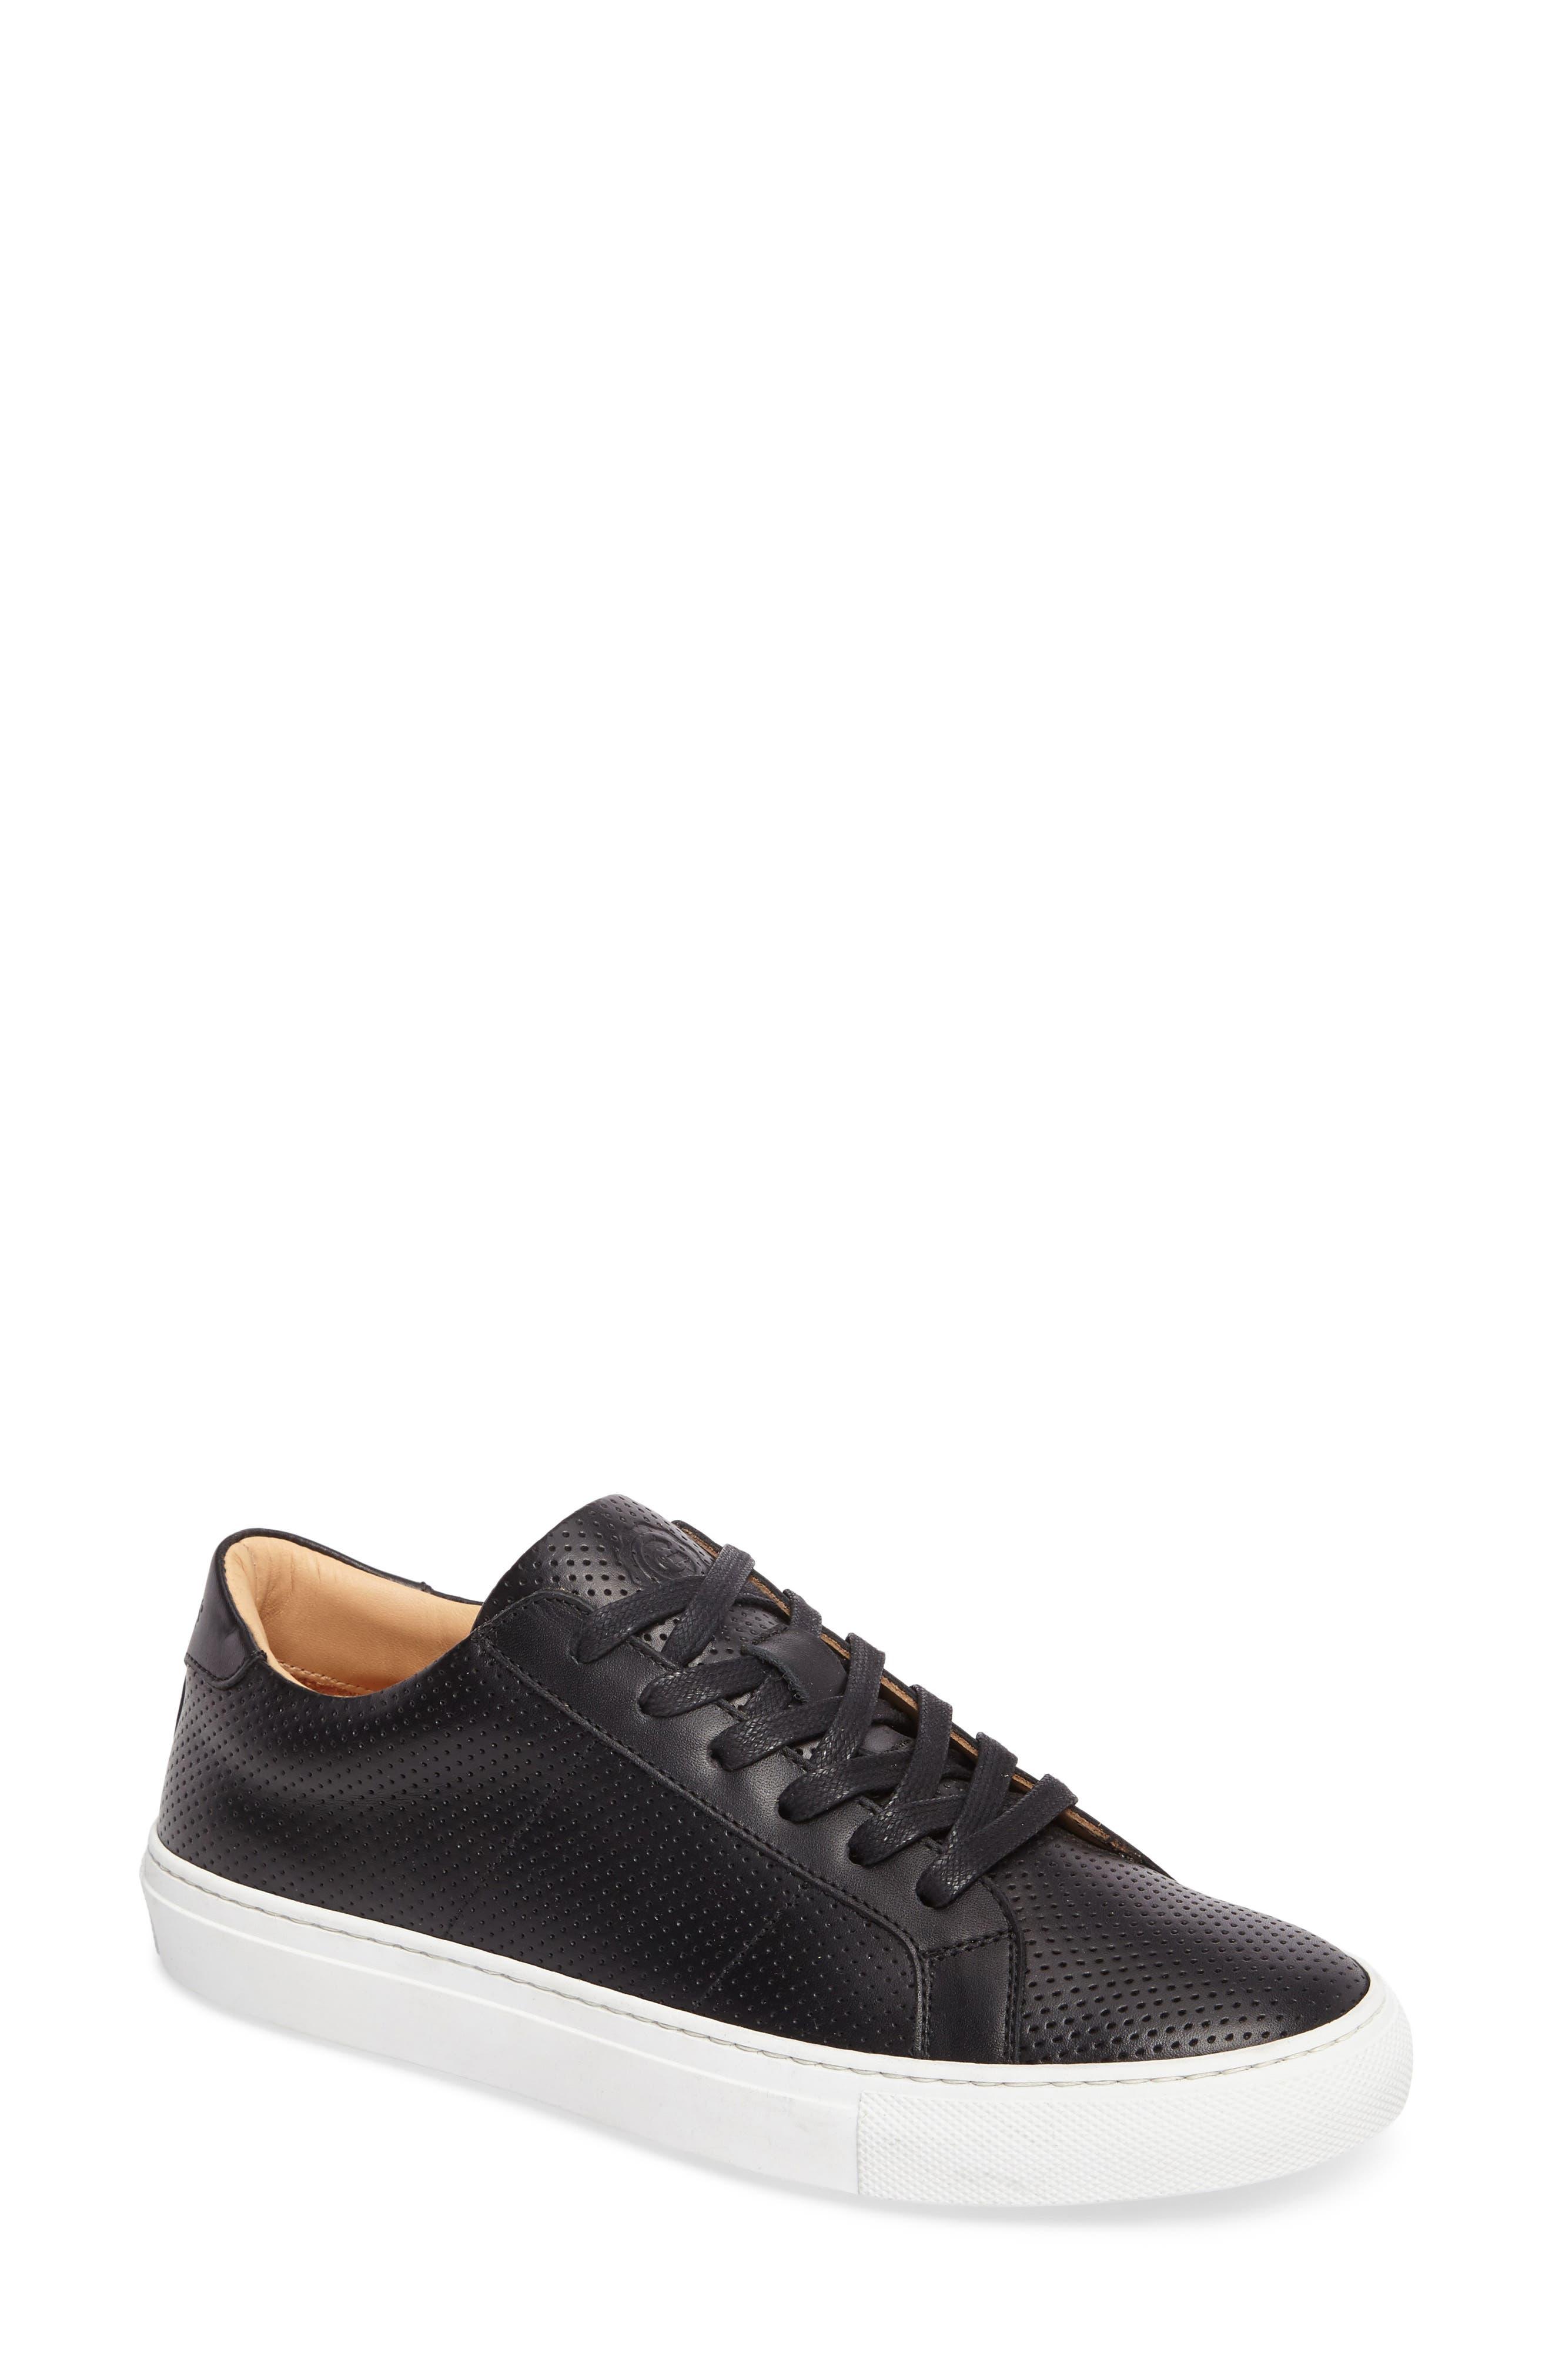 Royale Low Top Sneaker,                             Main thumbnail 1, color,                             BLACK PERFORATED